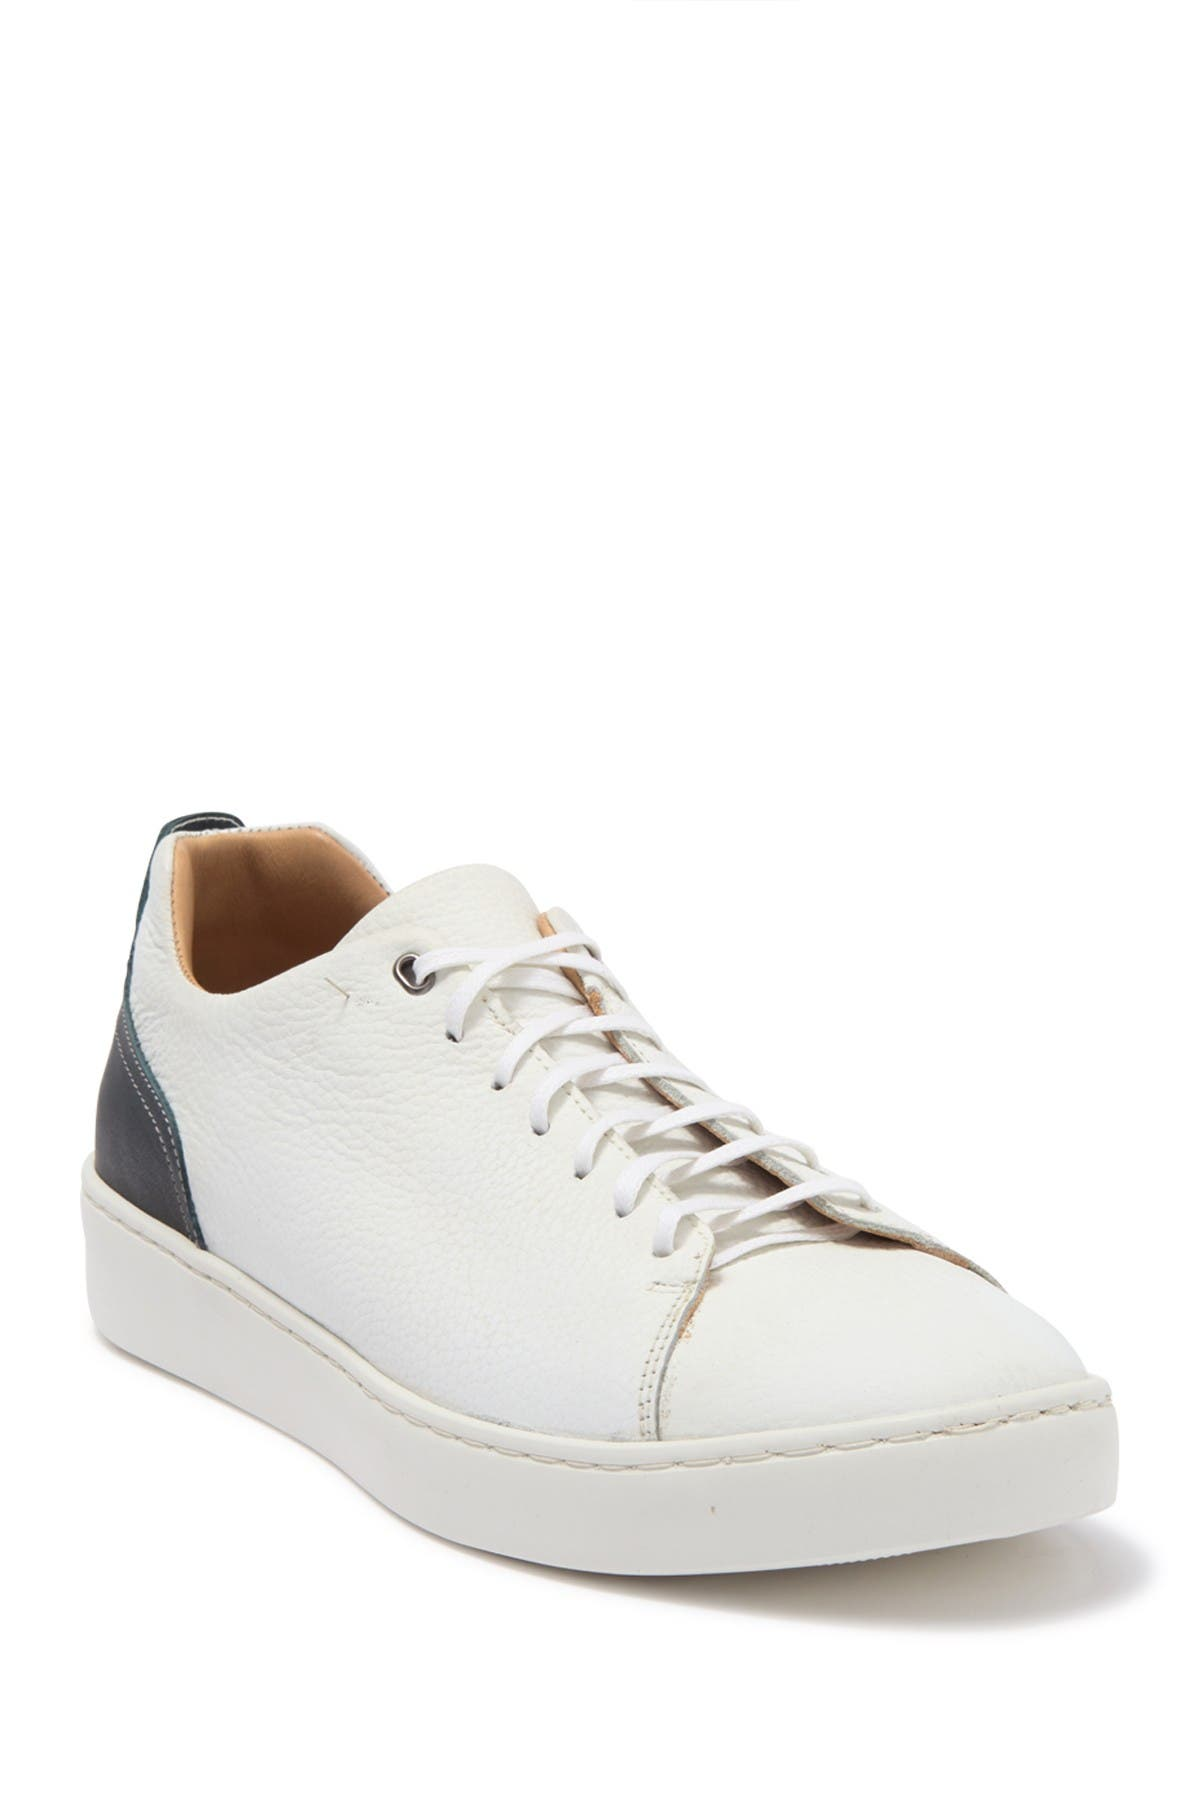 Image of Donald Pliner Alan Leather Sneaker